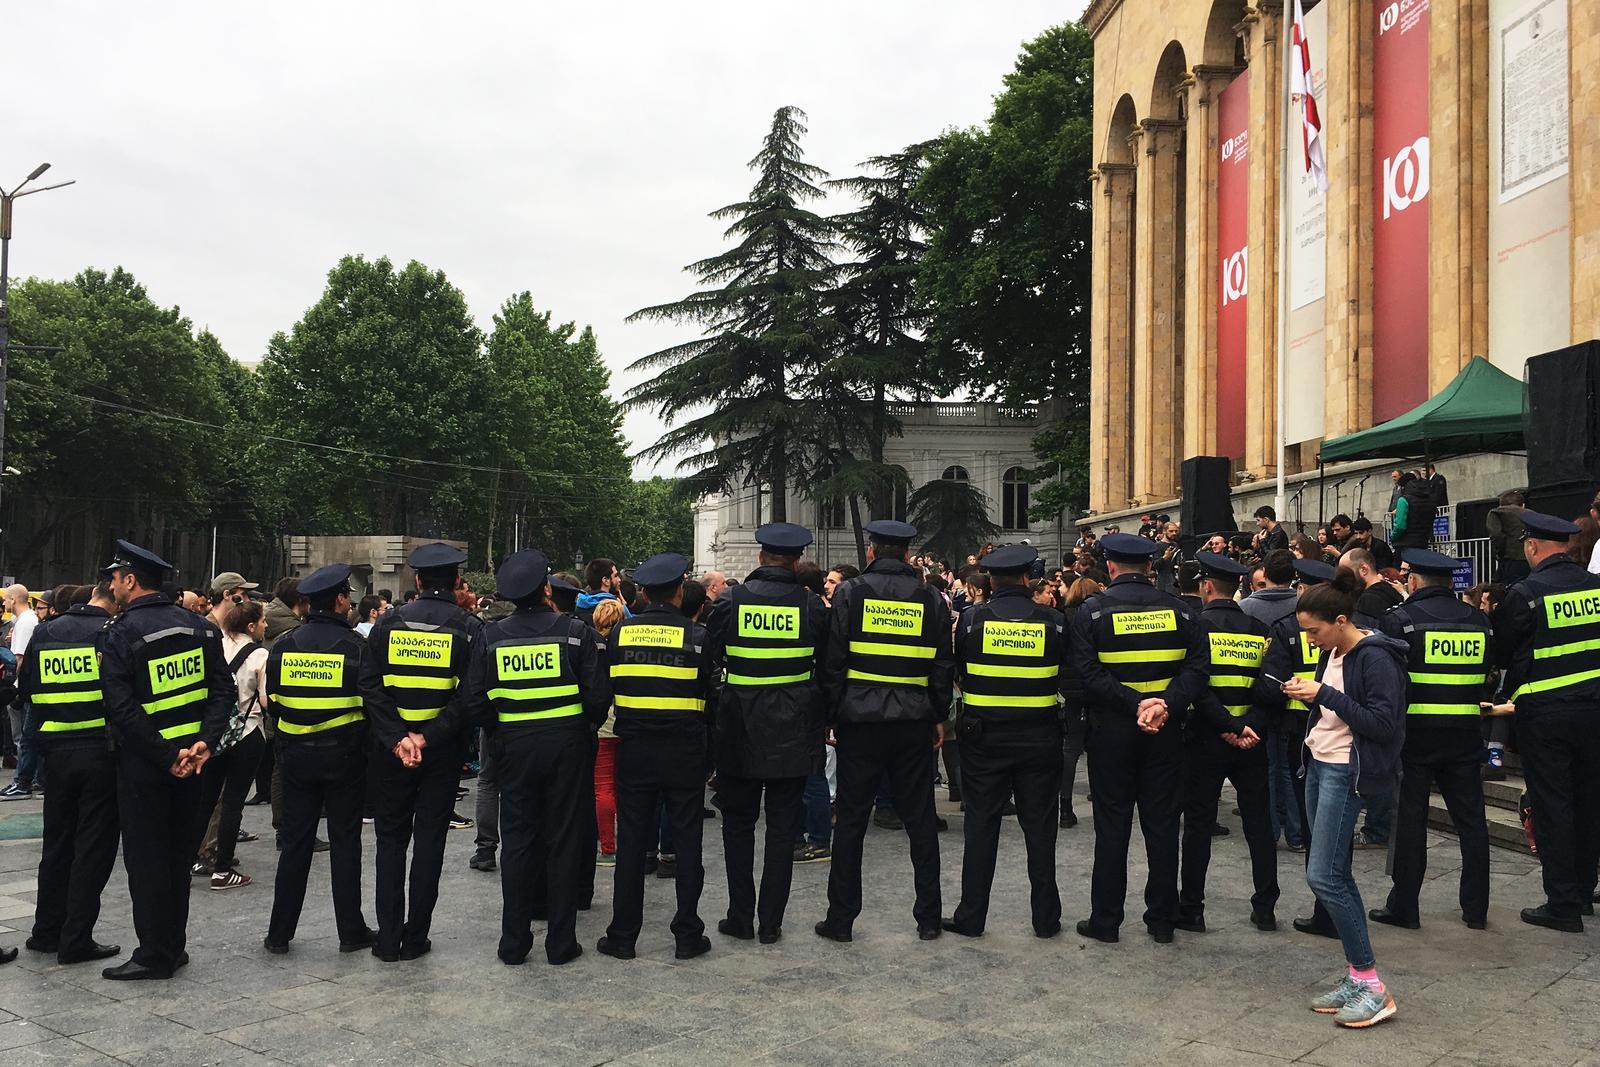 20180517-tiflis-police